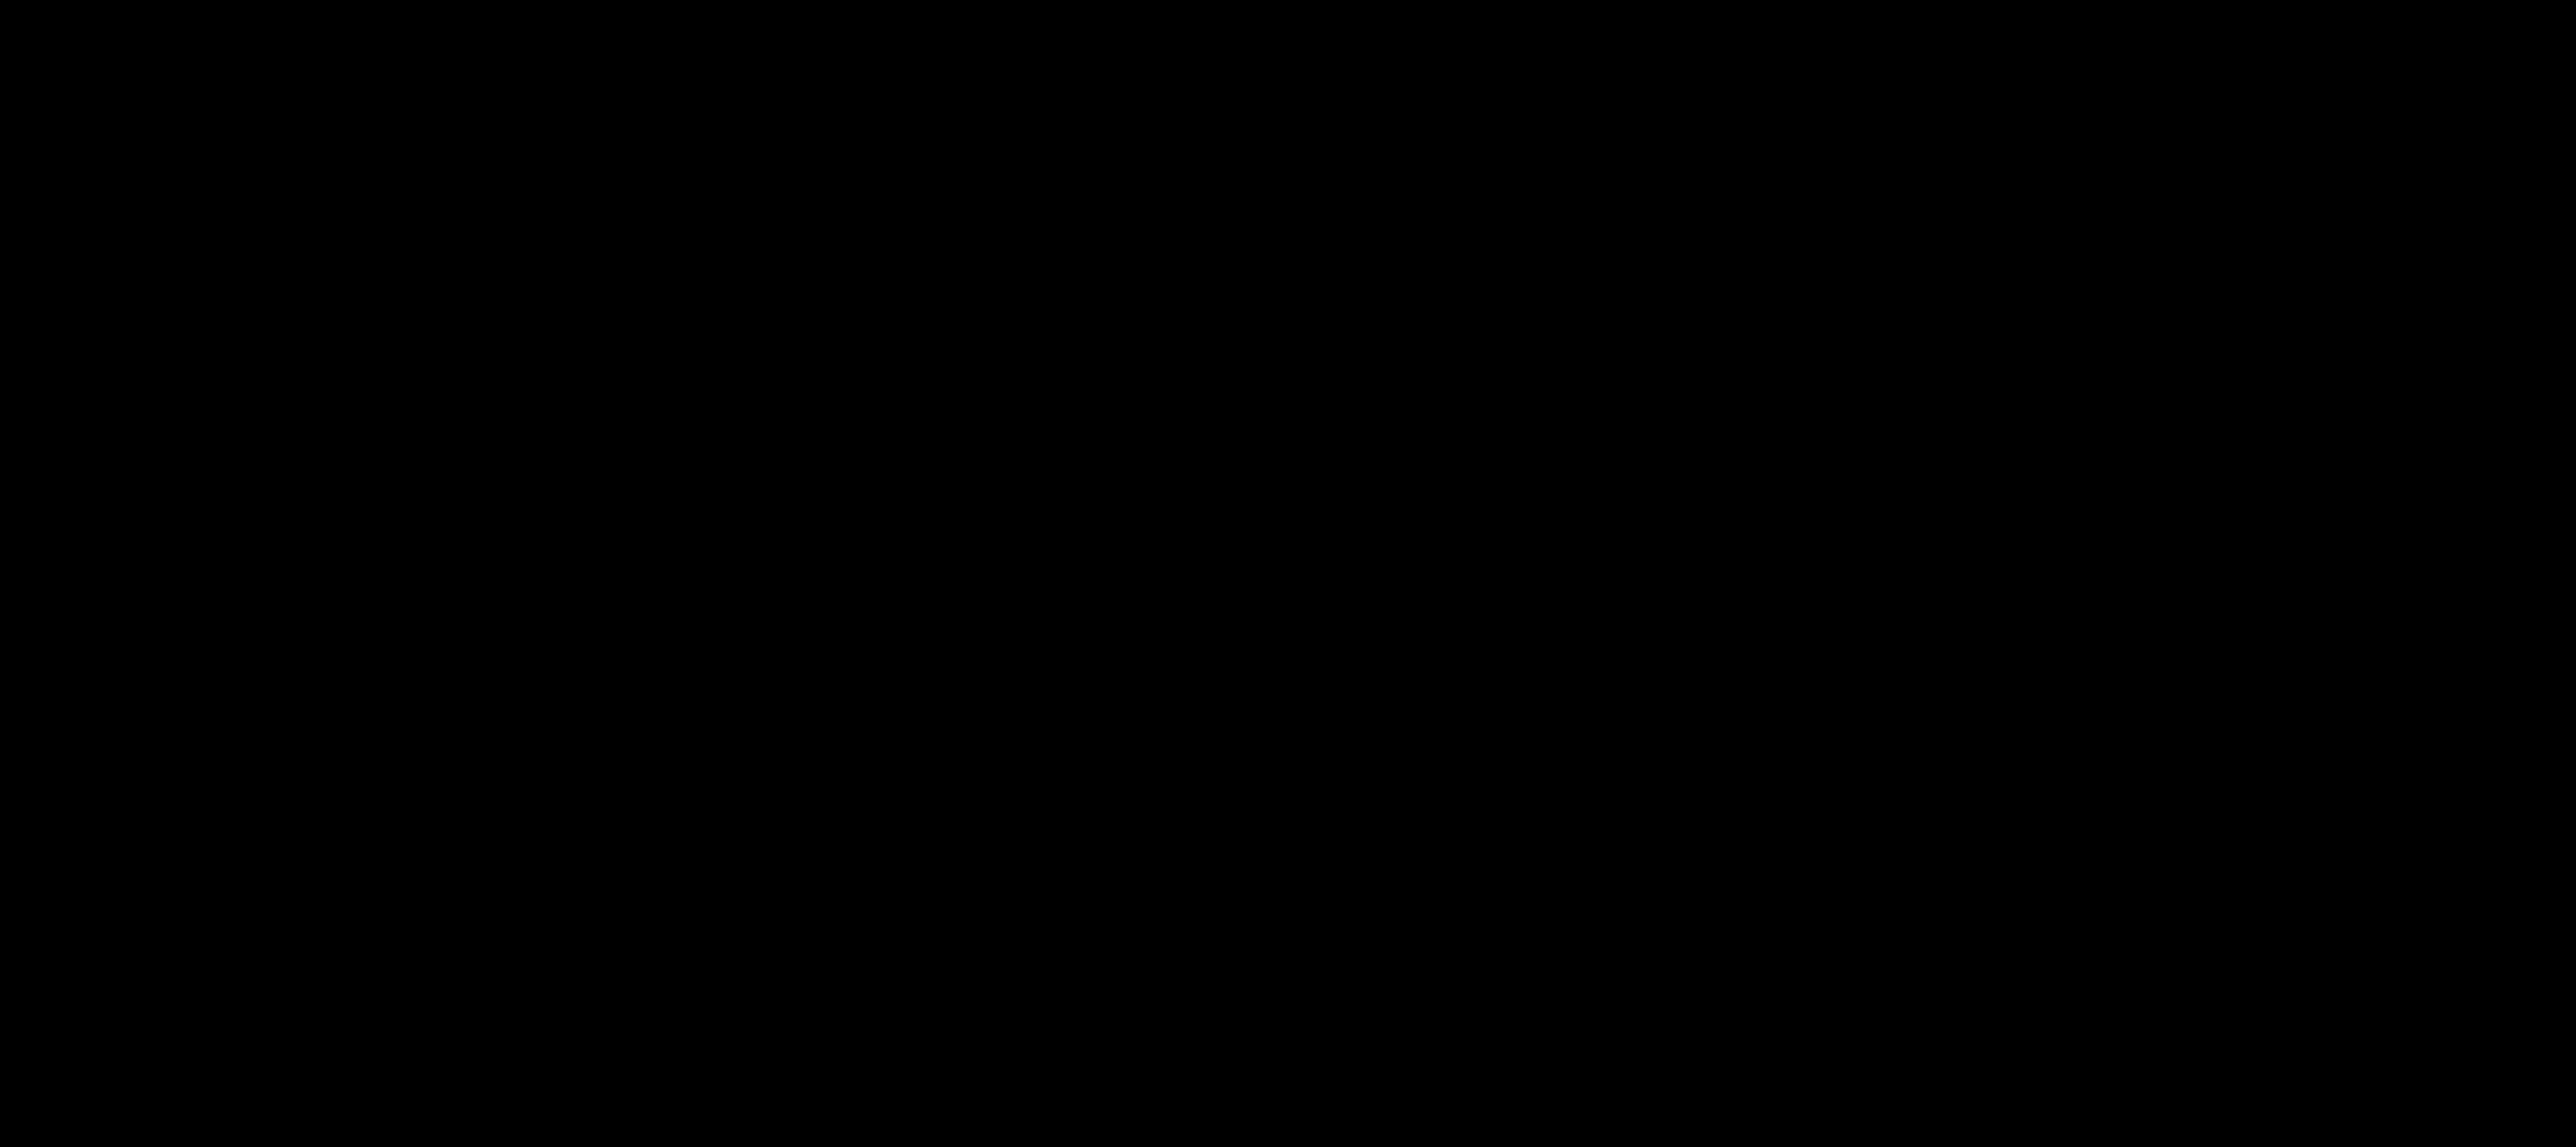 Графика на квадратно уравнение